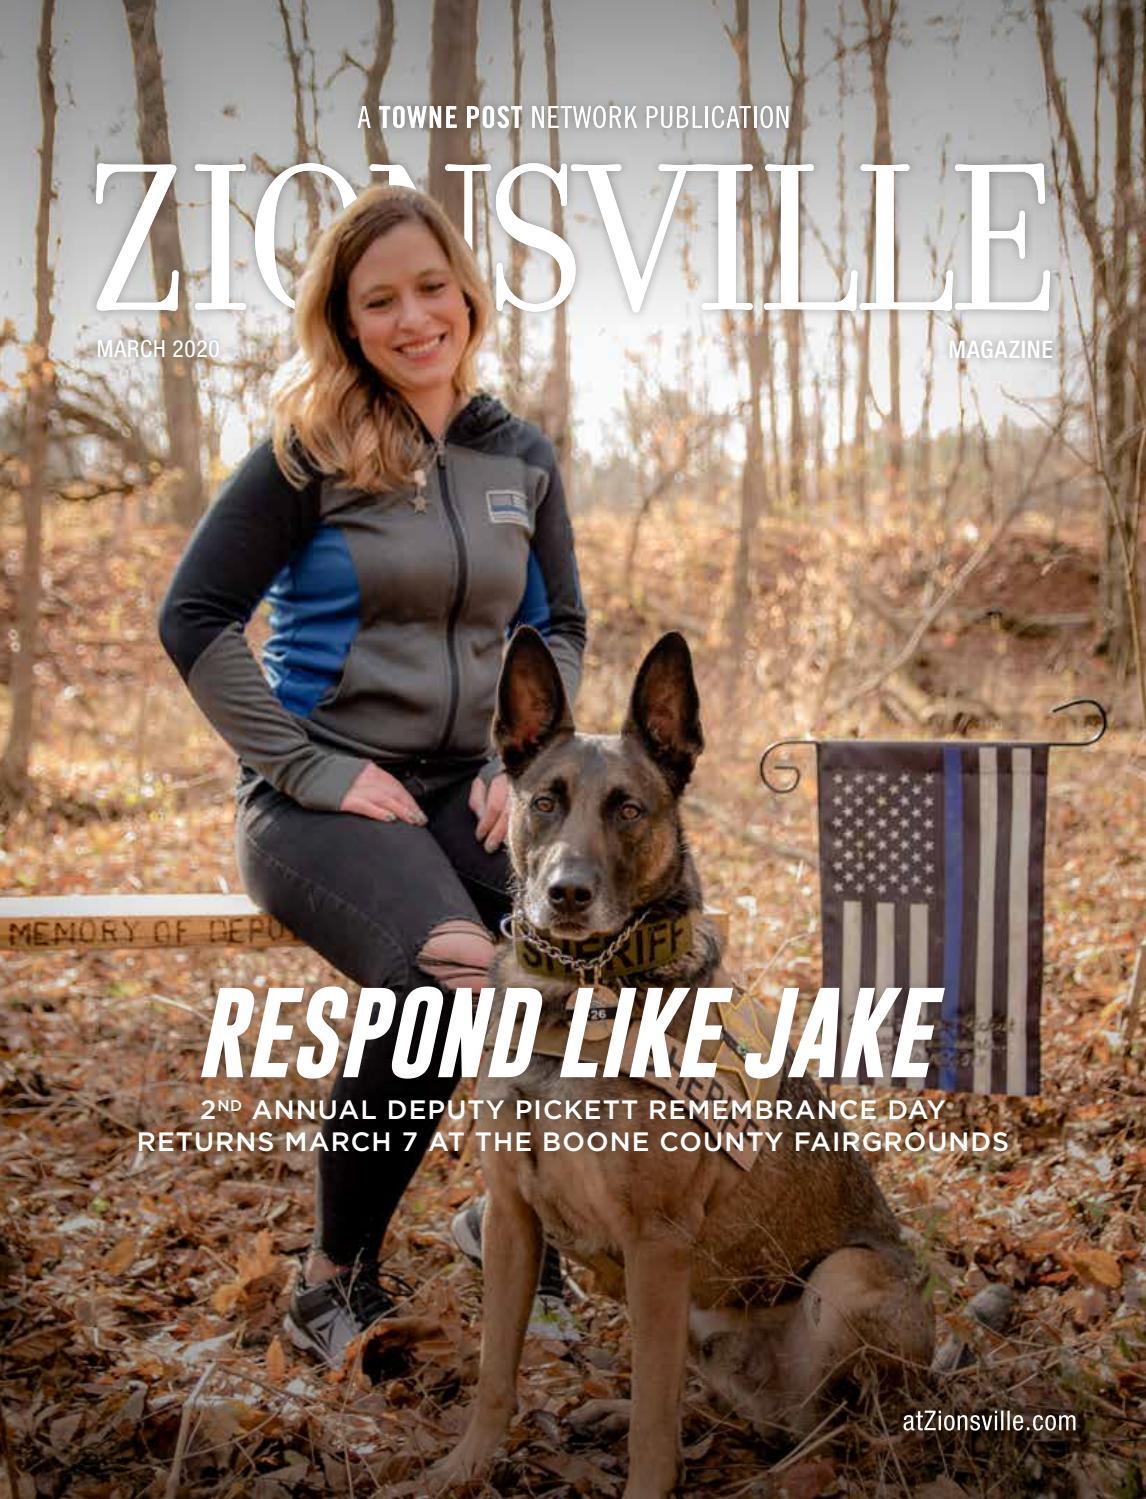 2020 Zionsville Christmas Break Zionsville Magazine March 2020 by Towne Post Network, Inc.   issuu